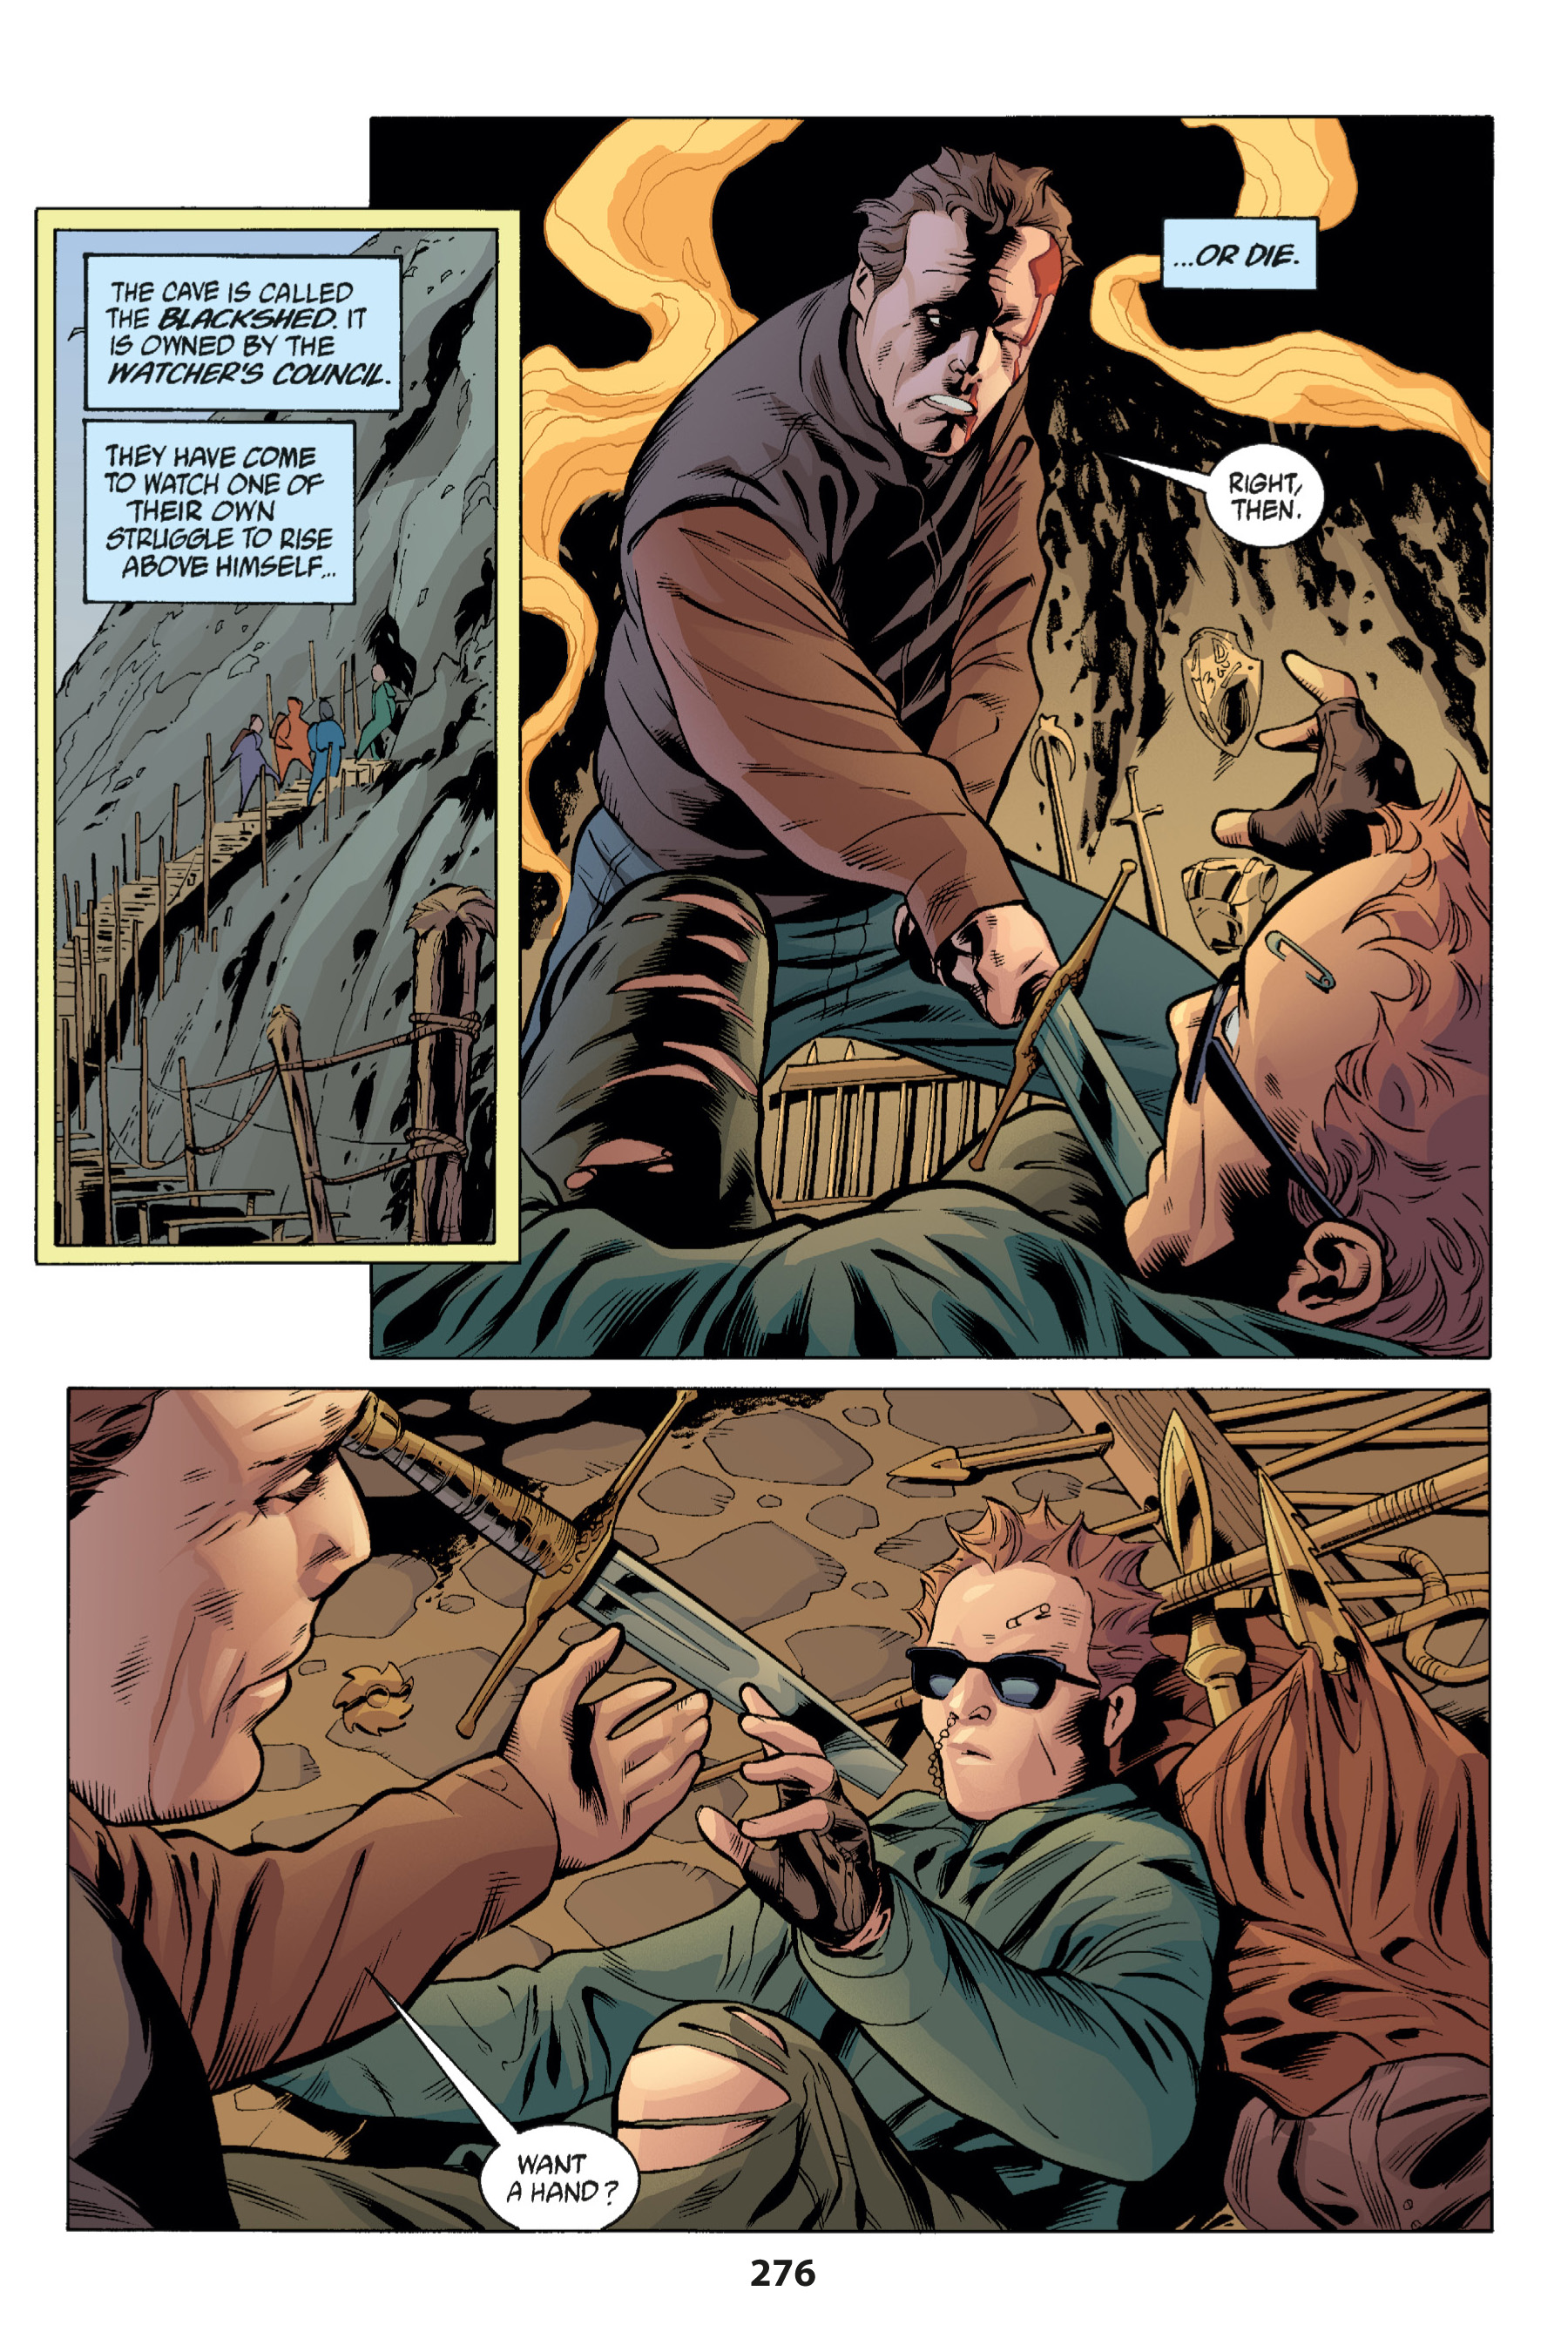 Read online Buffy the Vampire Slayer: Omnibus comic -  Issue # TPB 1 - 267